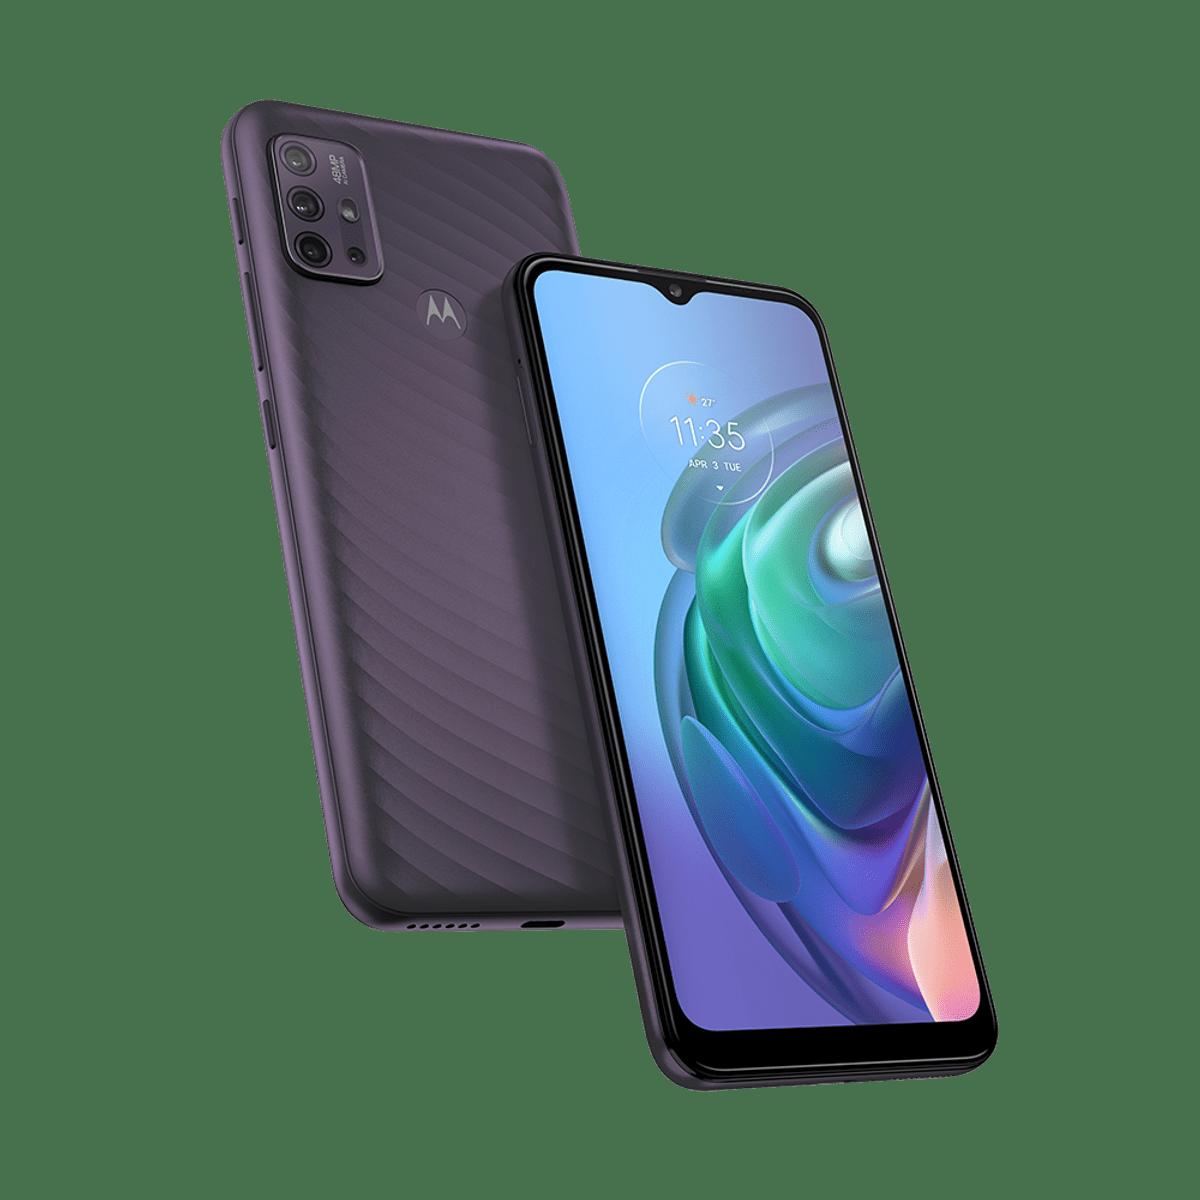 Motorola Moto g10 aurora gray, 4/64 GB